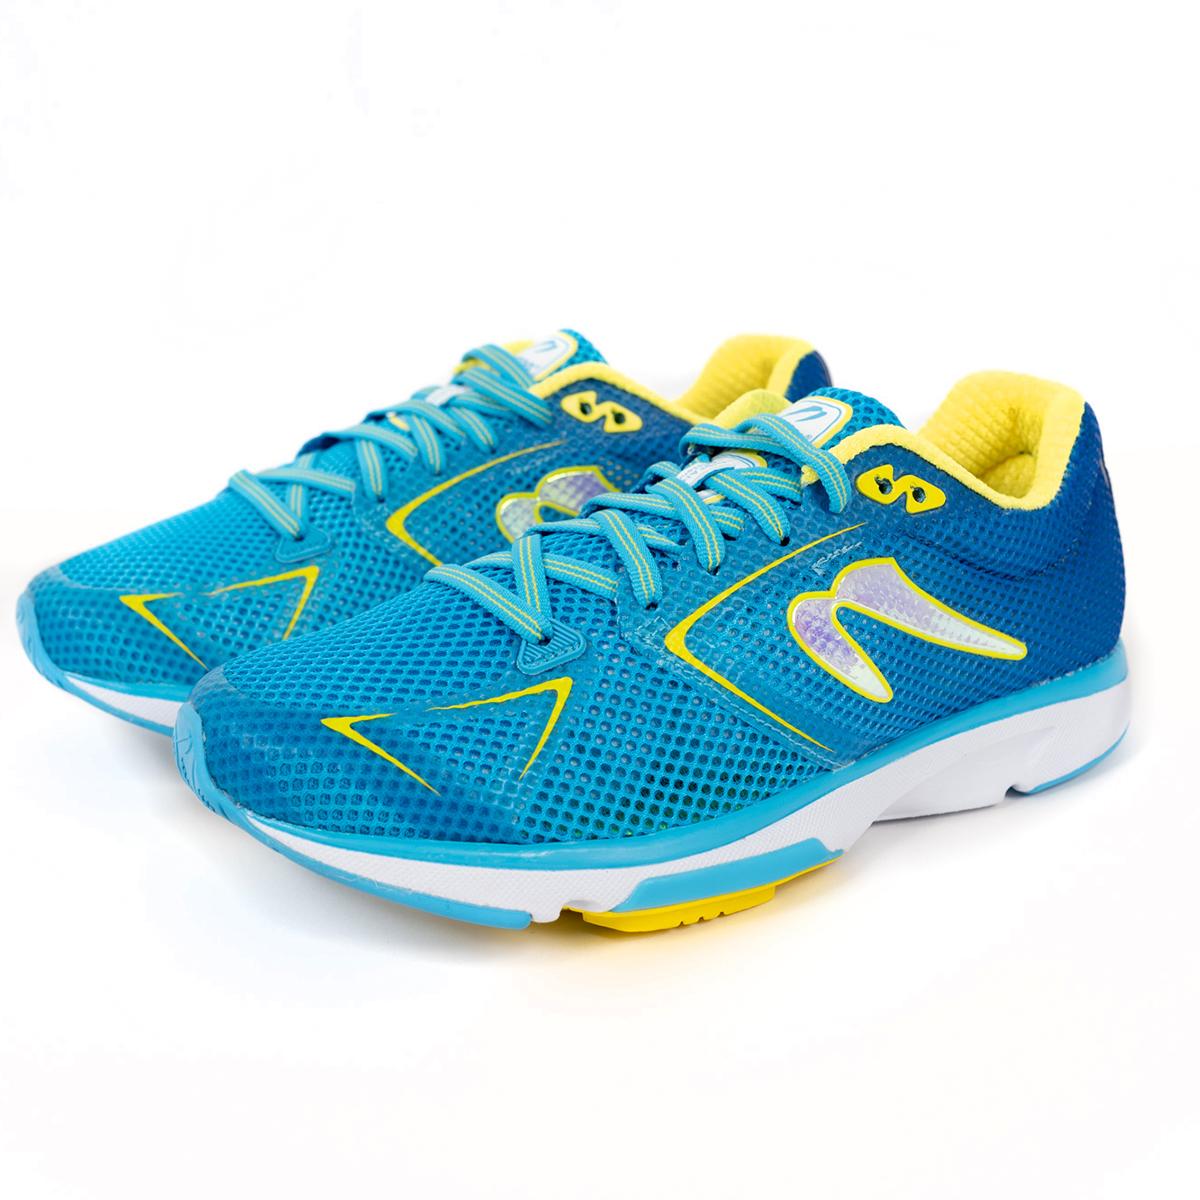 Women's Newton Distance 9 Running Shoe - Color: Laguna/Yellow (Regular Width) - Size: 5, Laguna/Yellow, large, image 3